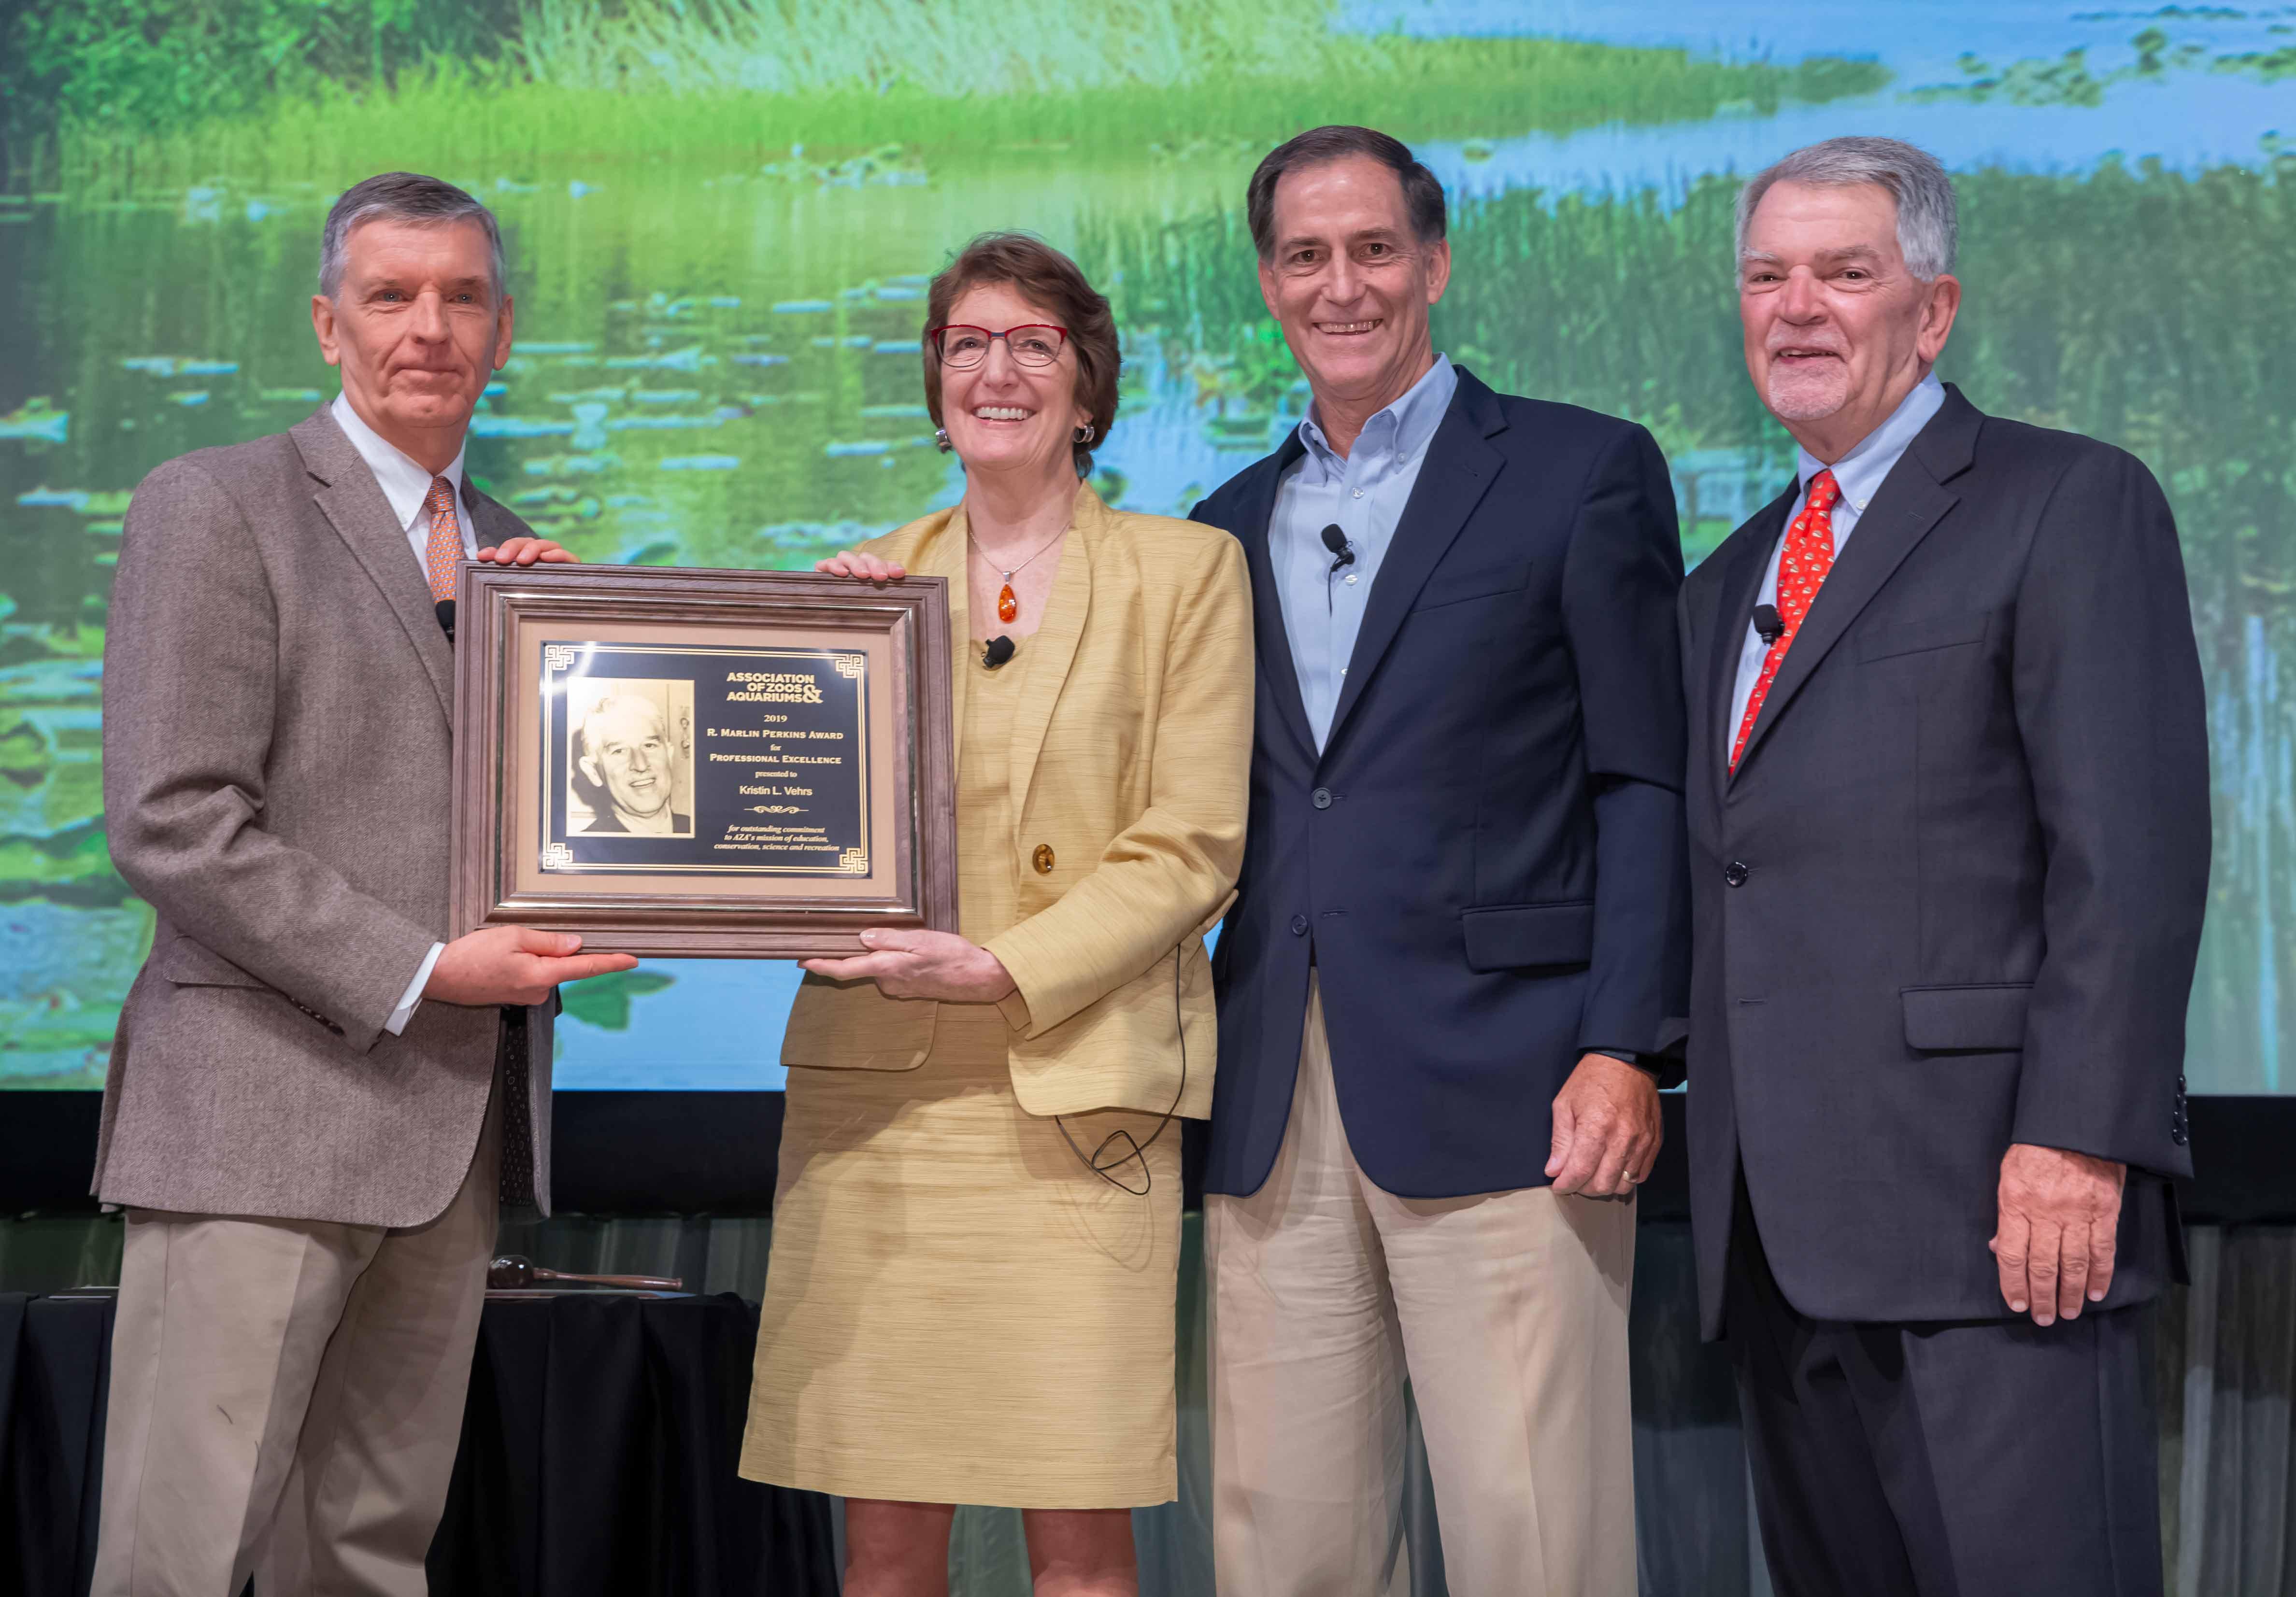 Kris Vehrs receiving the Marlin Perkins Award